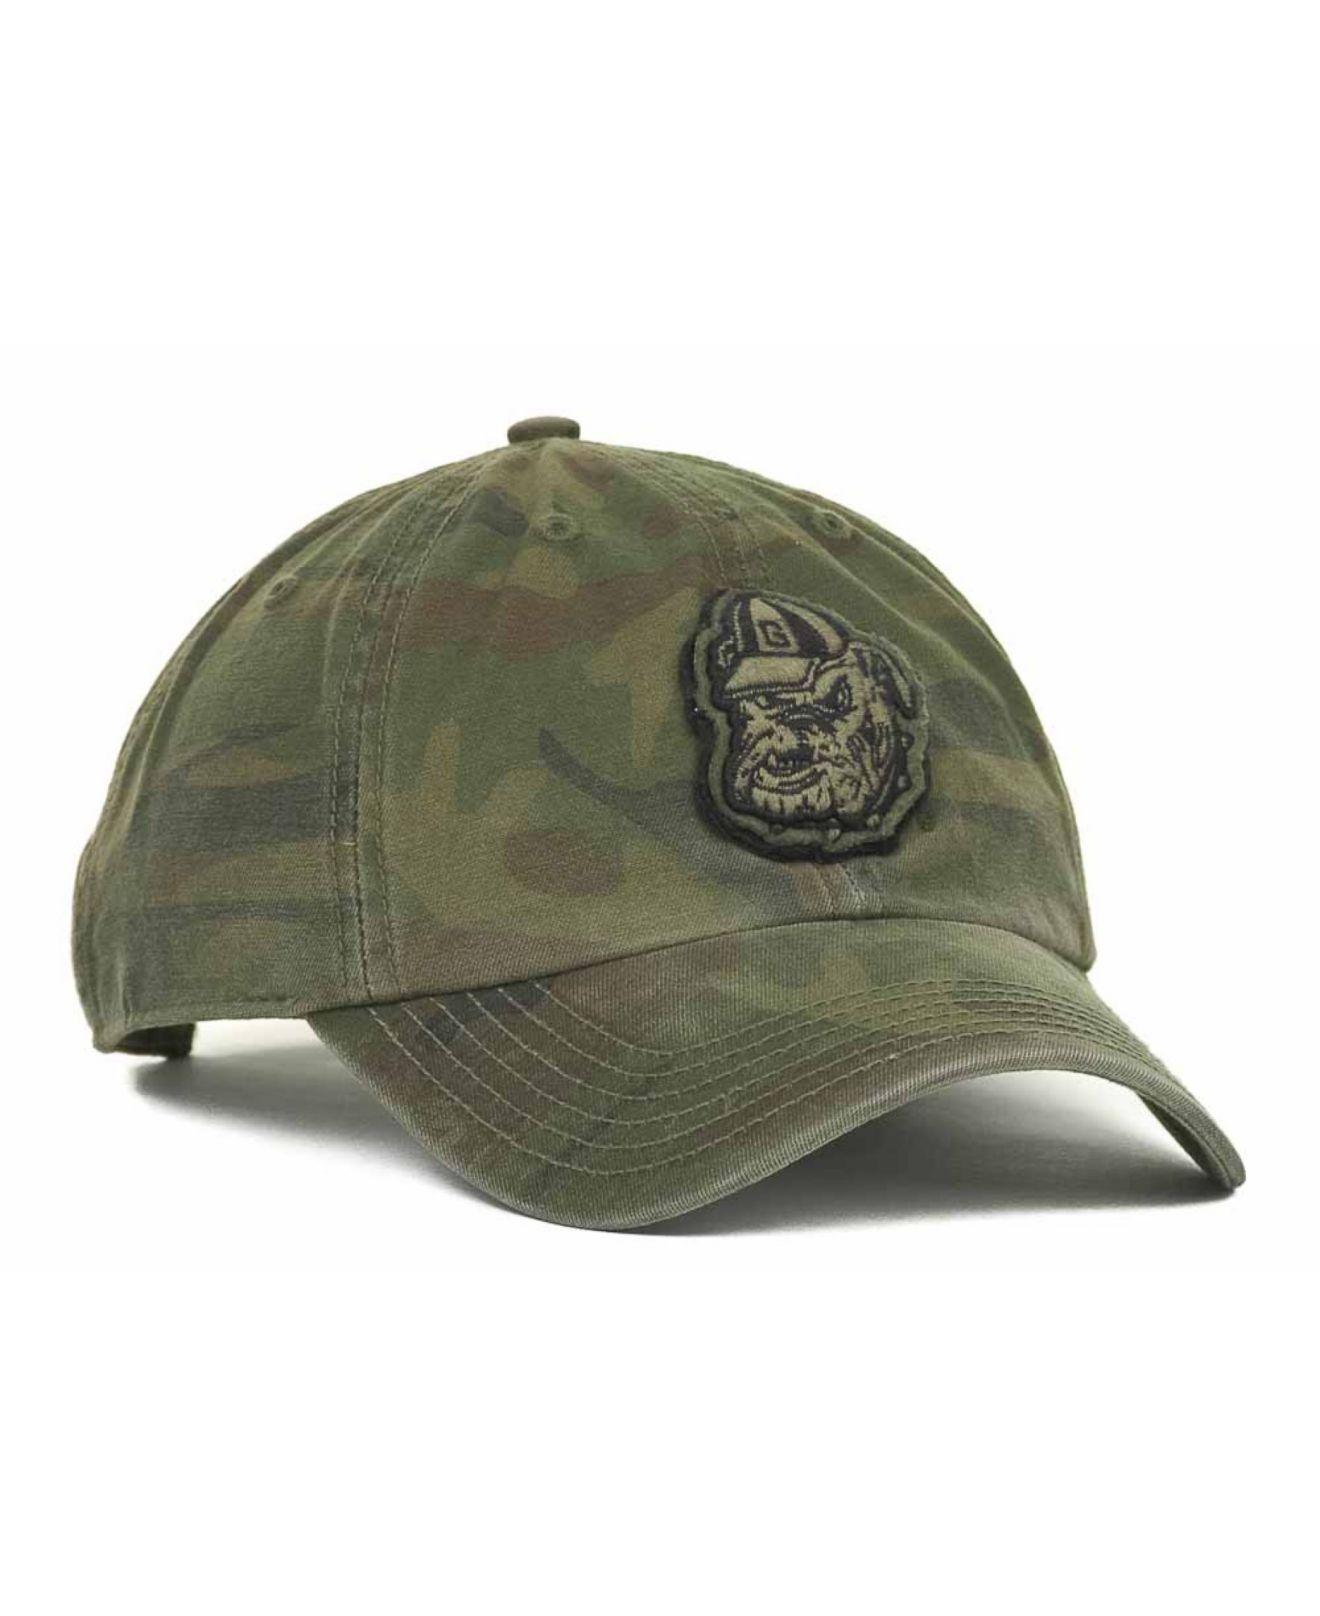 d4d11f0b05ed9 Lyst - 47 Brand Georgia Bulldogs Oht Movement Clean Up Cap in Green ...